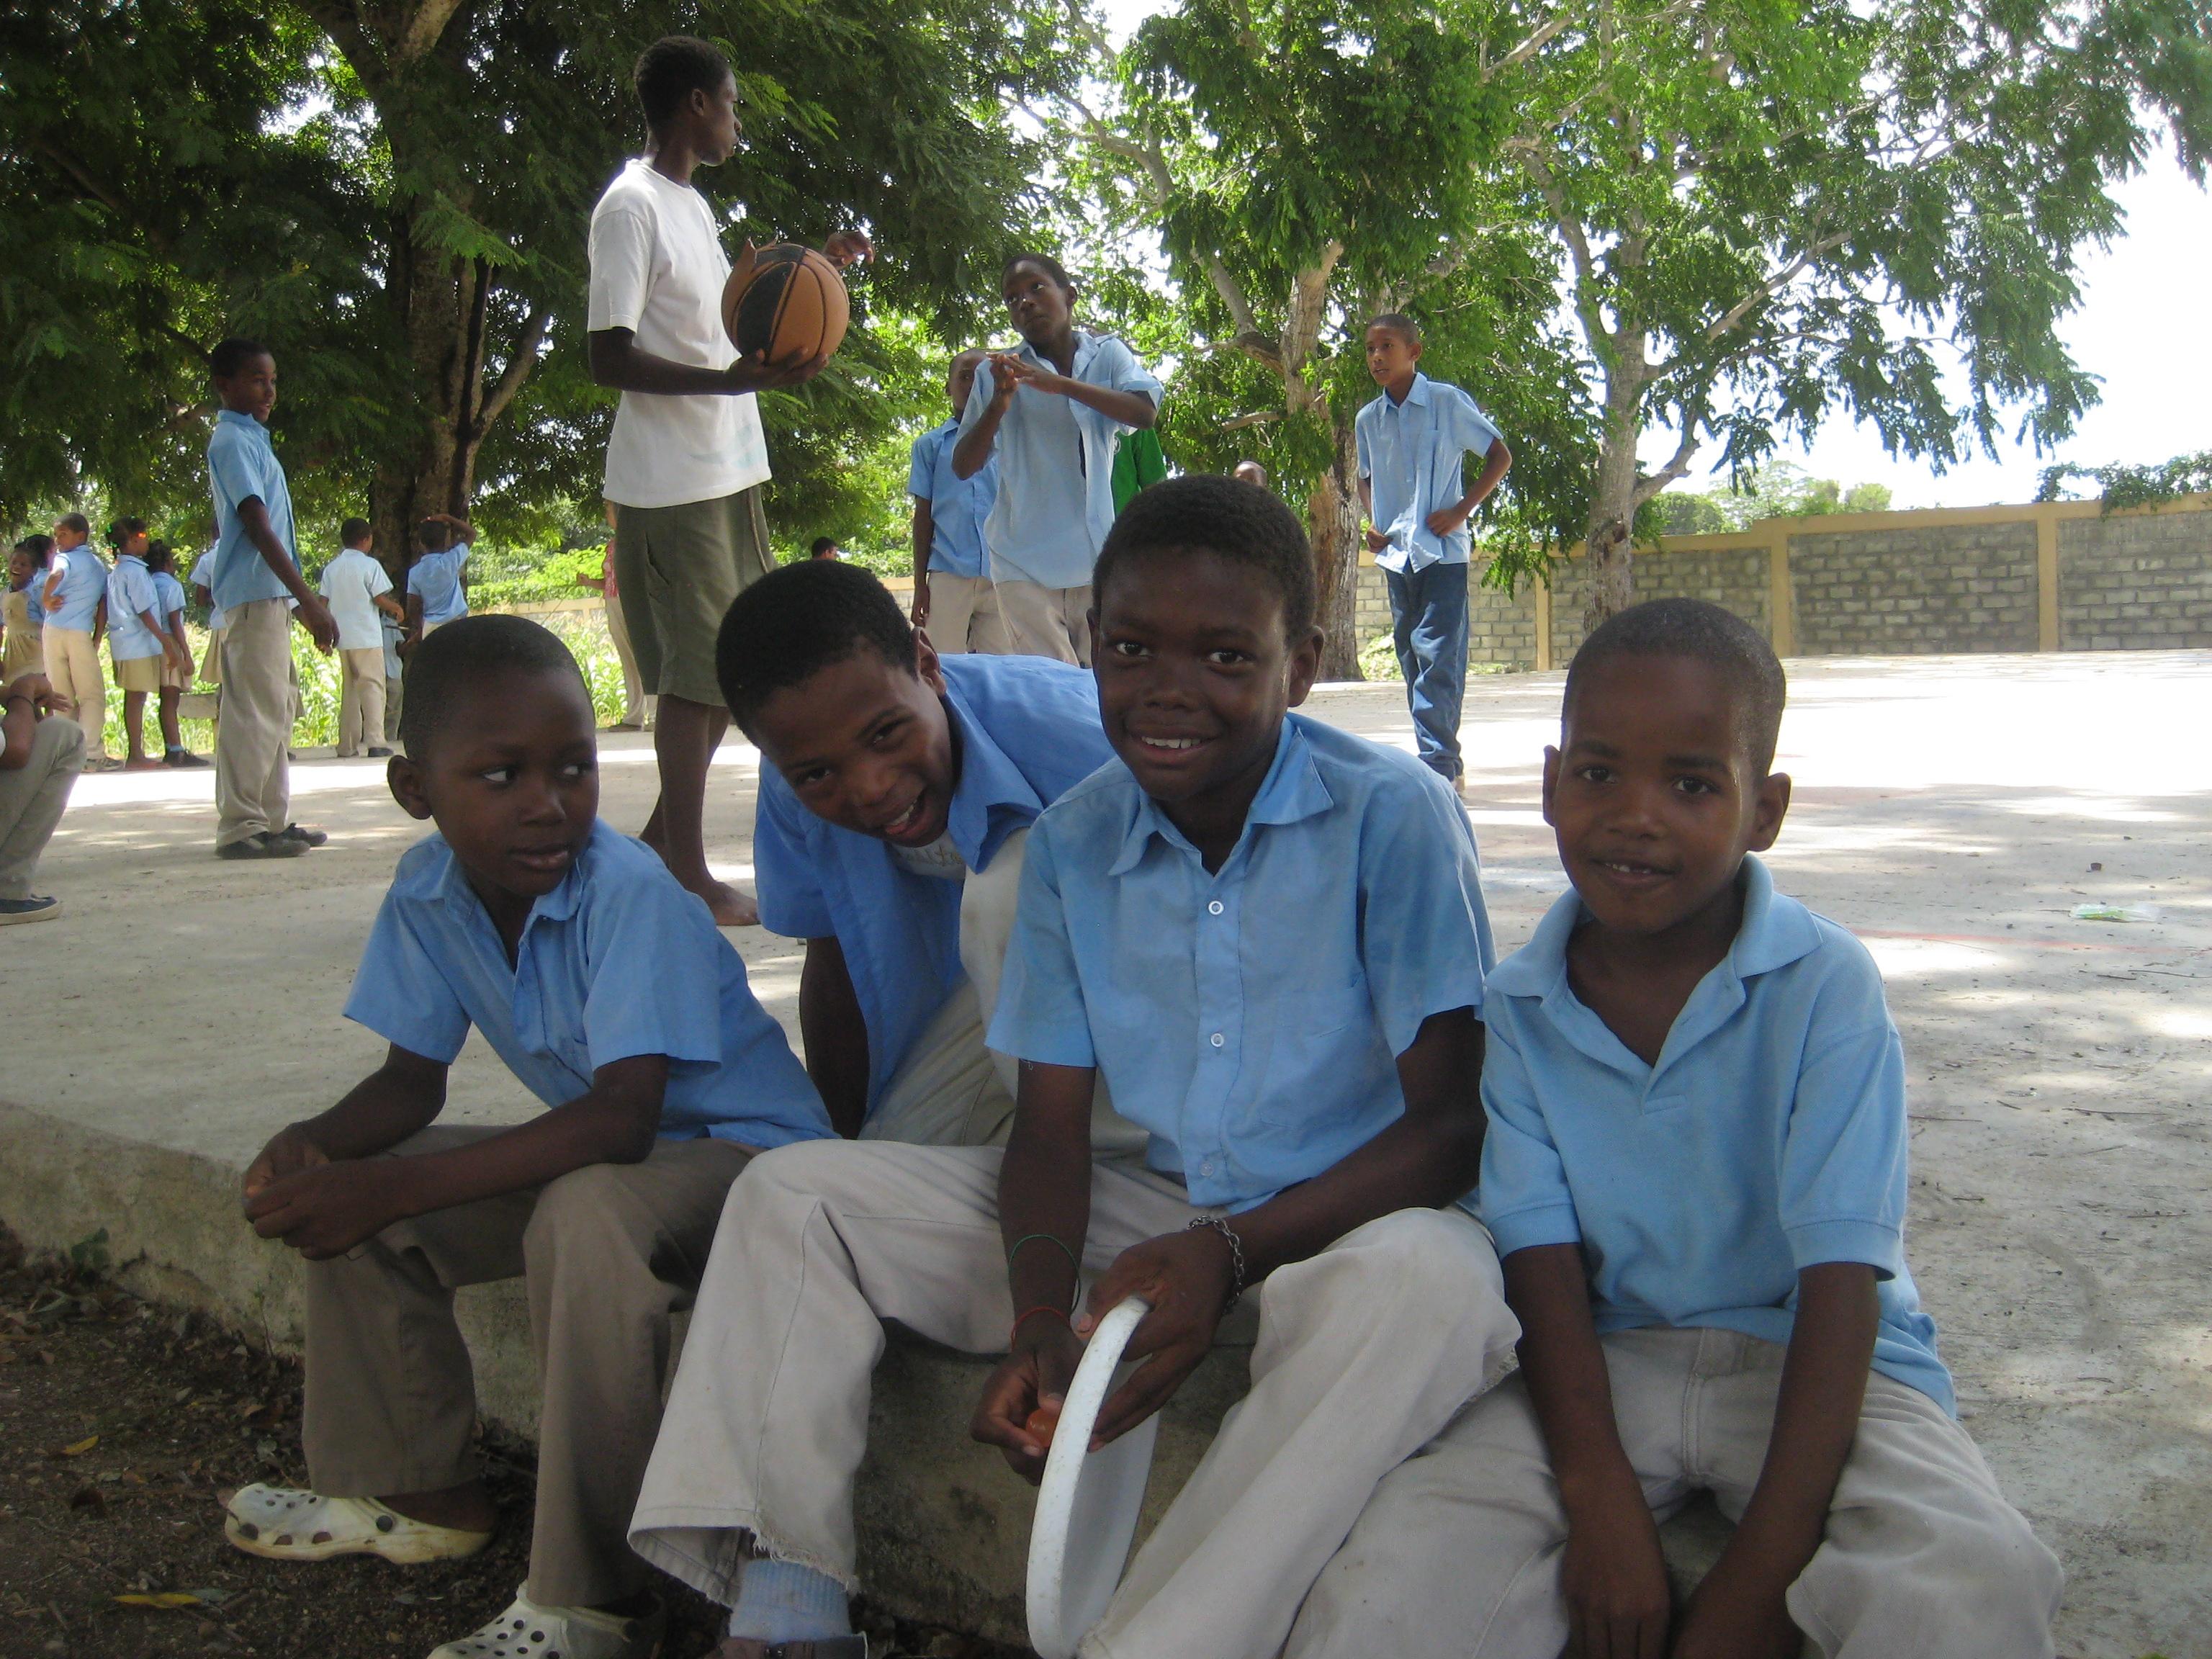 Escuela Consuelo (R. Dominicana)